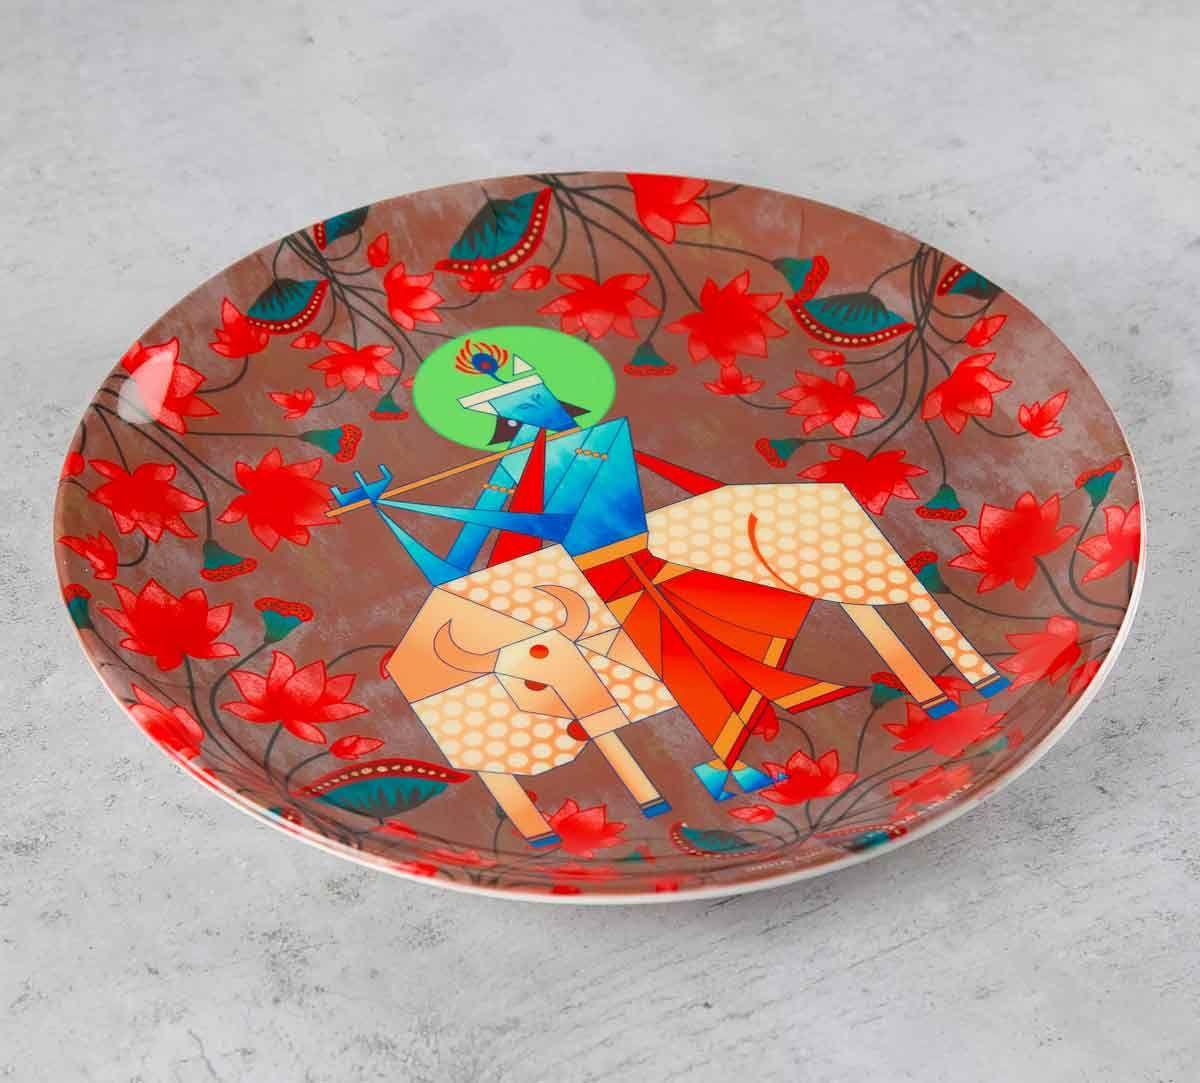 India Circus Geometrical Krishna 10 inch Decorative and Snacks Platter